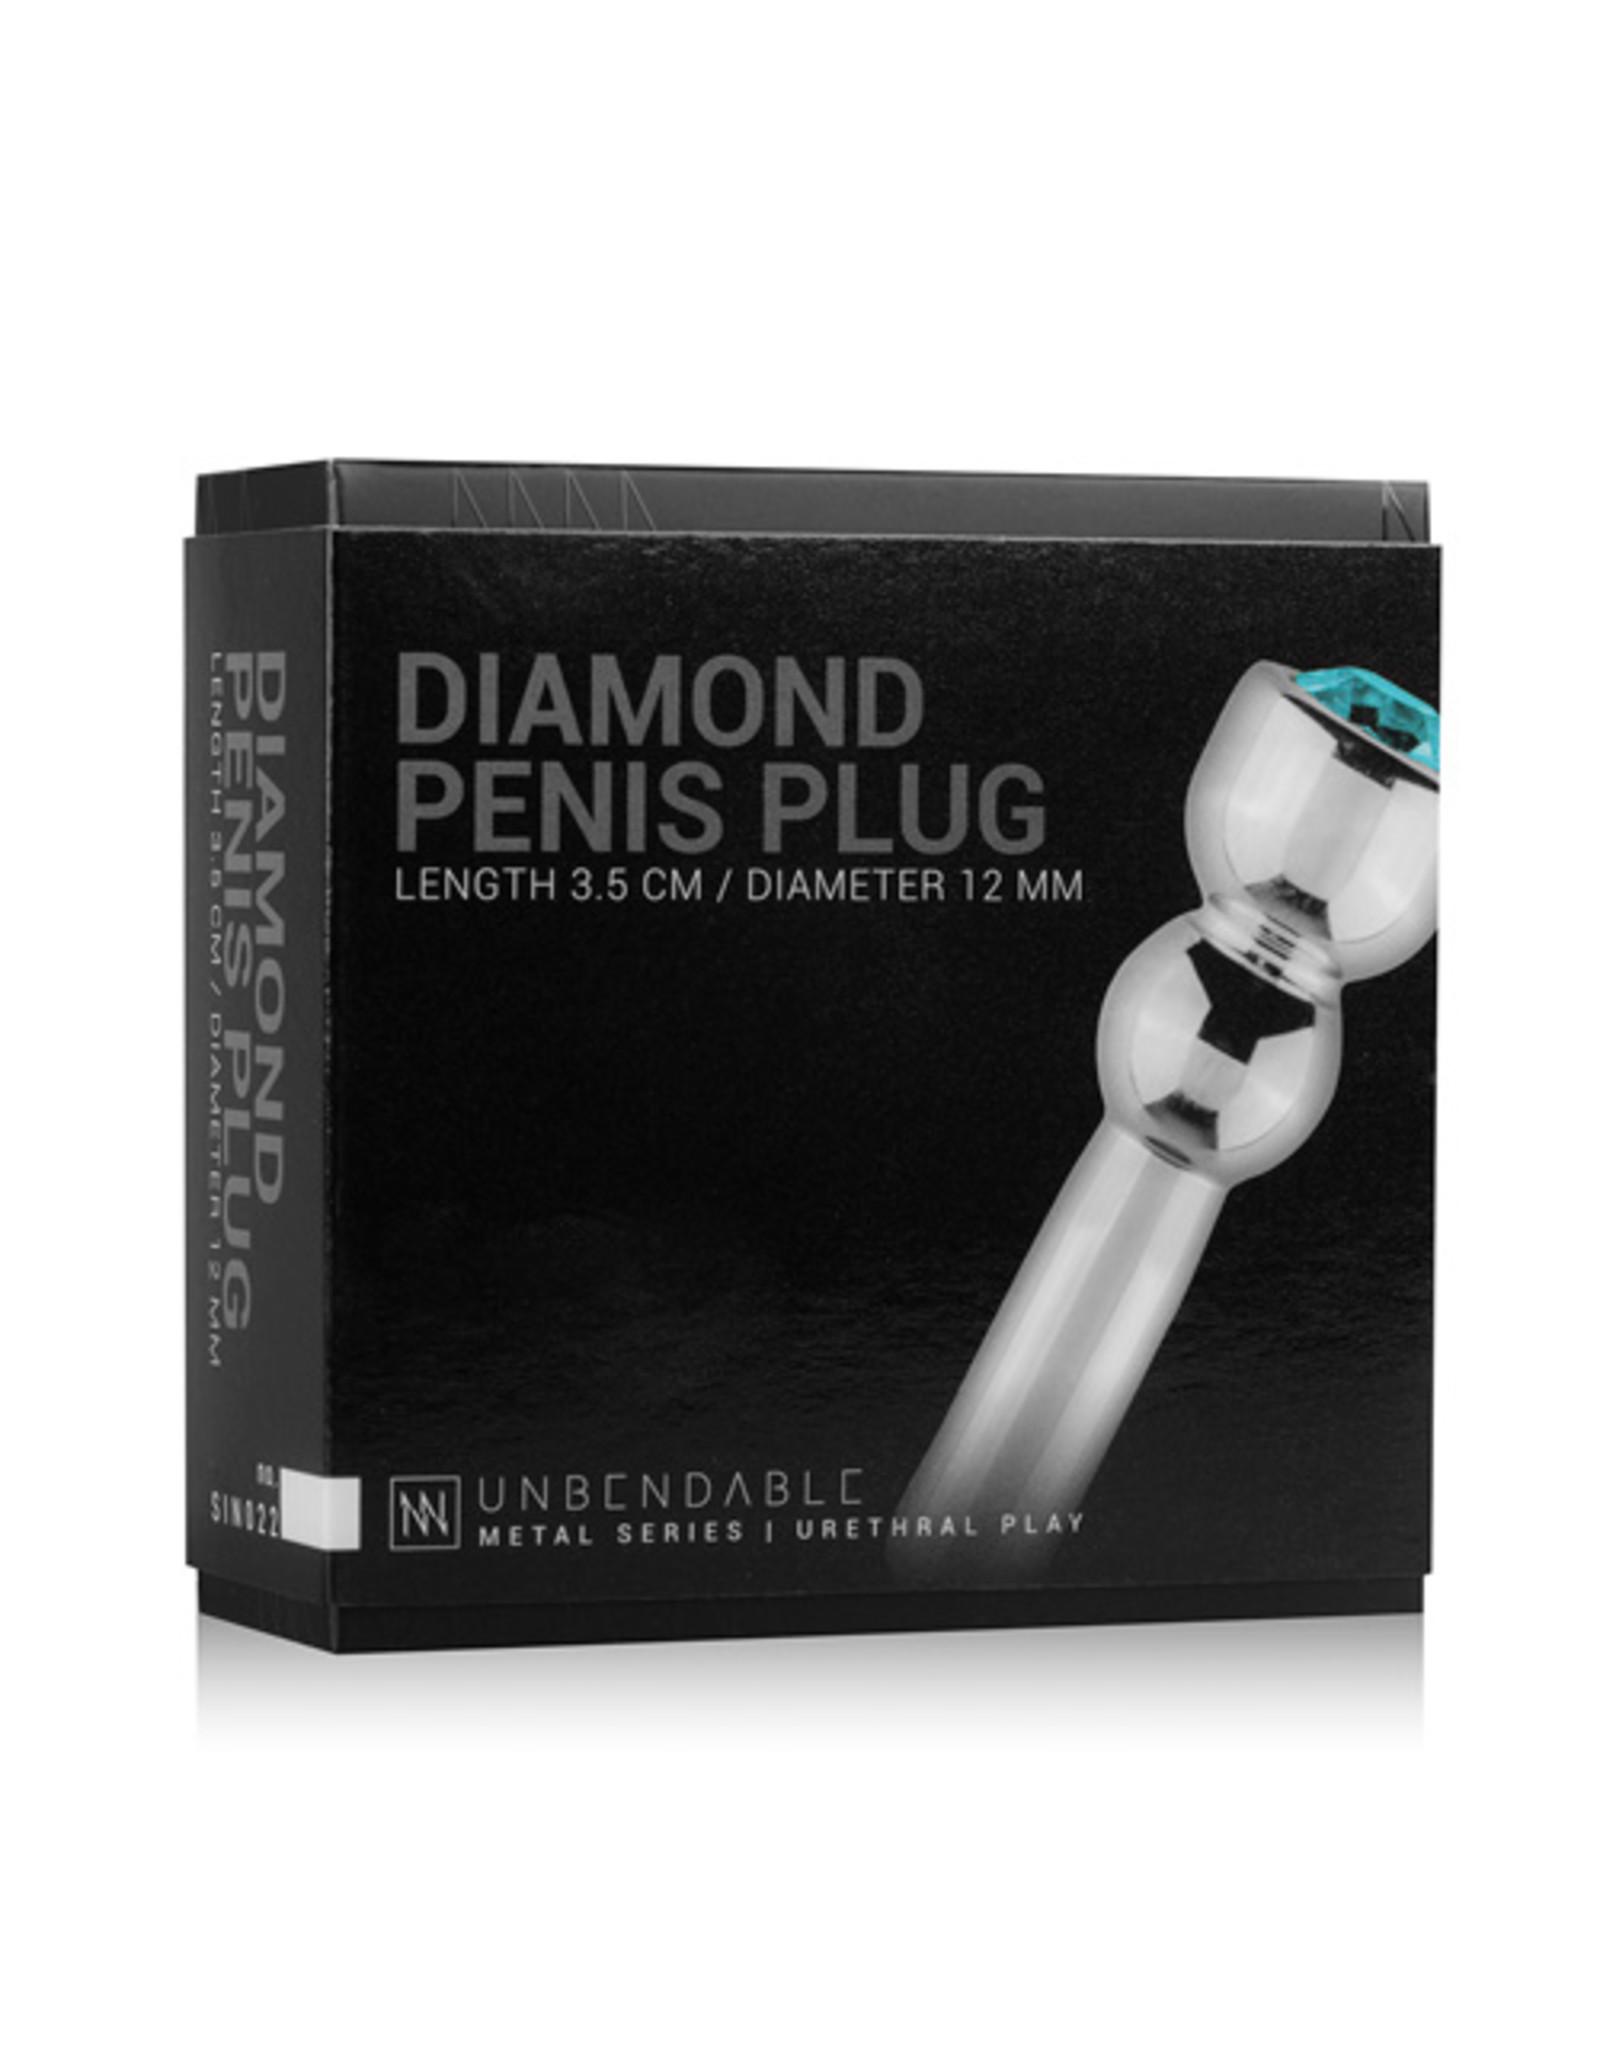 Sinner Gear Unbendable Penis Plug Met Diamond - Zilver/Blauw